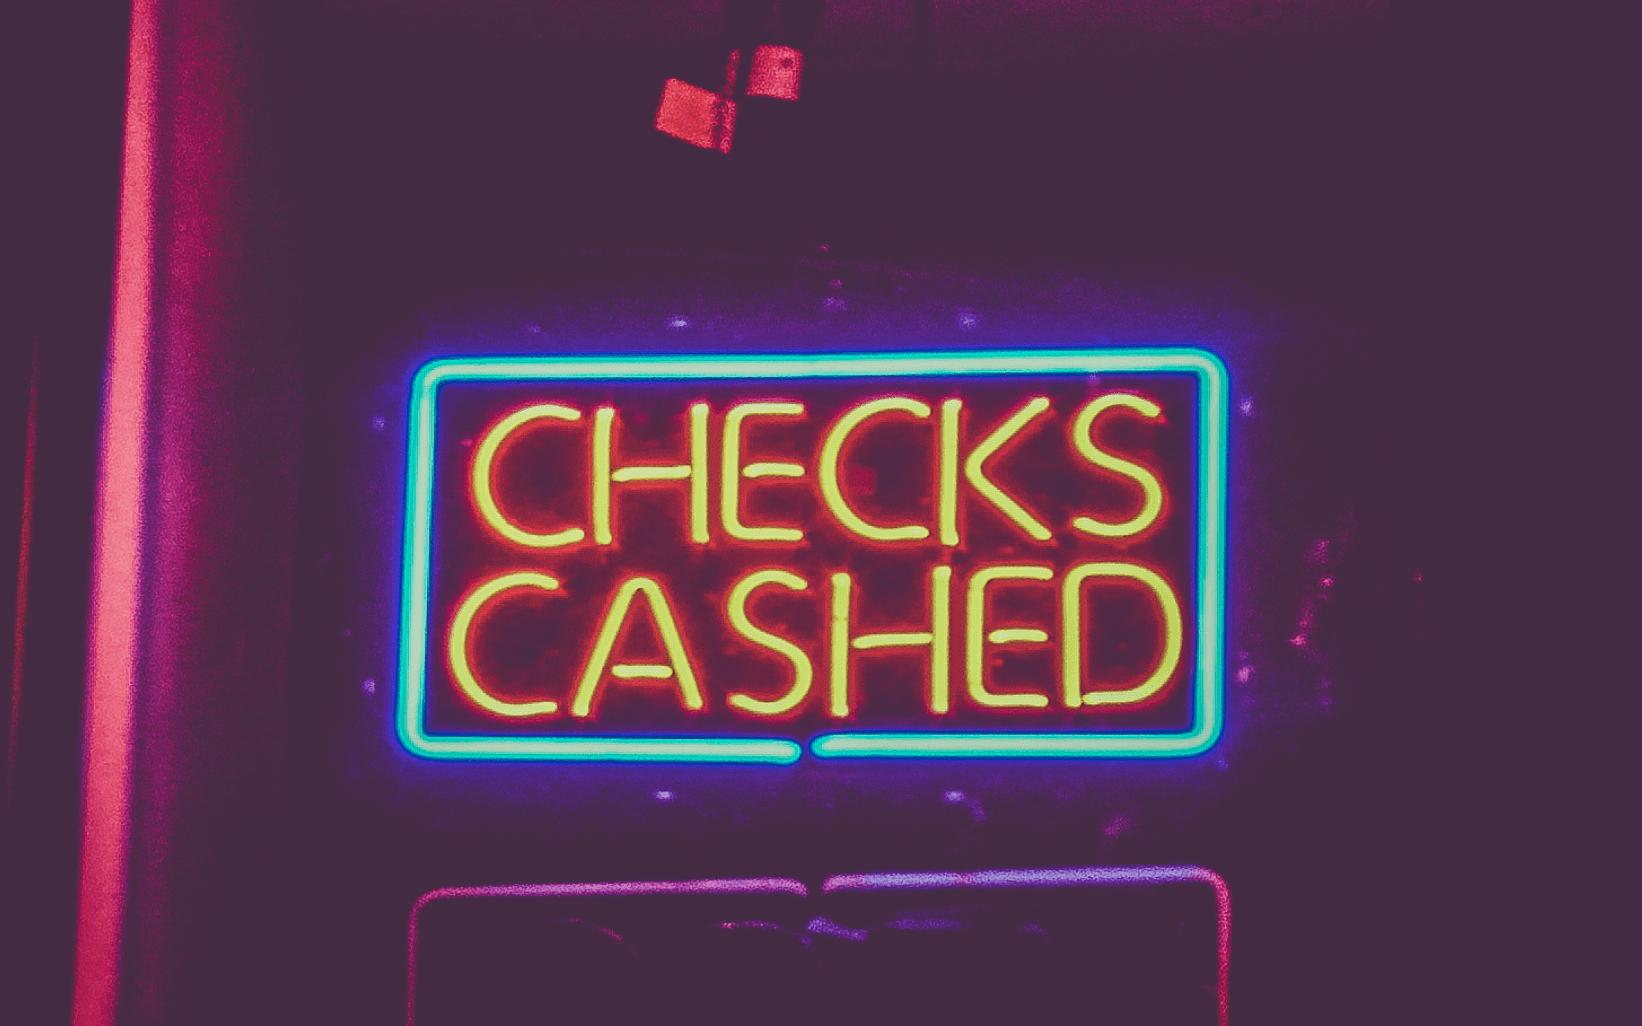 After Black man wins discrimination lawsuit, bank refuses to cash his checks